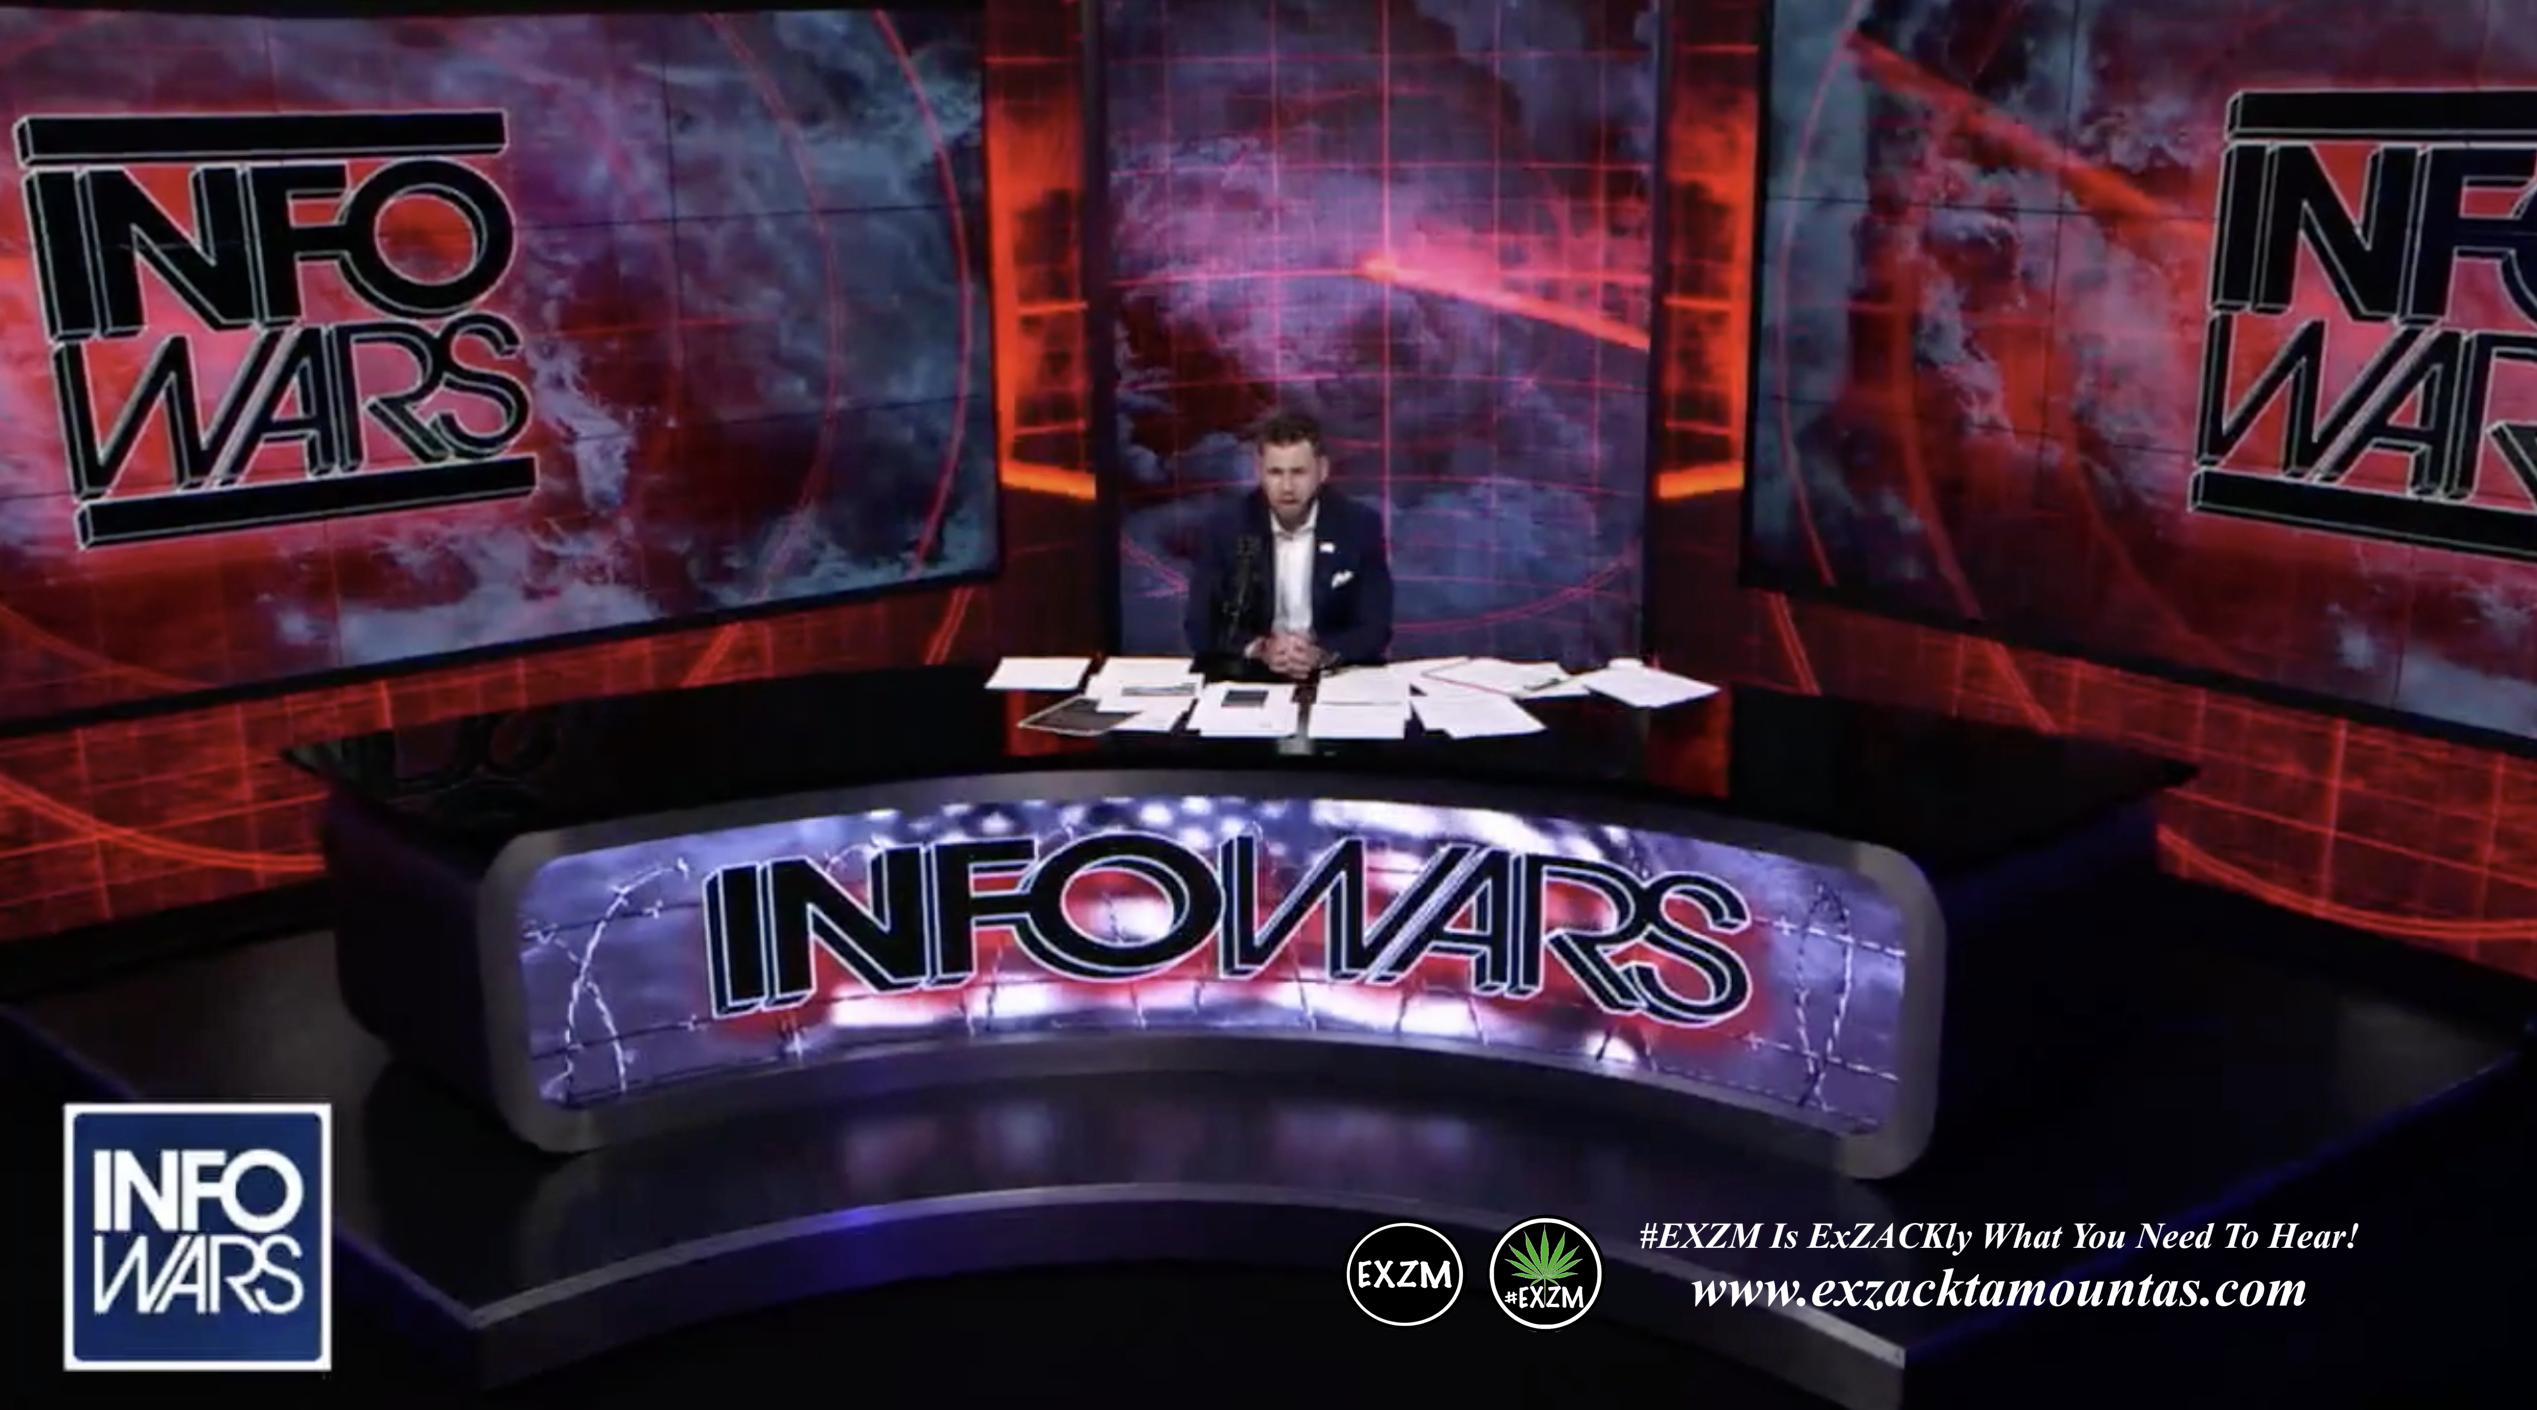 Alex Jones Owen Shroyer Live Infowars Studio EXZM Zack Mount April 25th 2021 copy